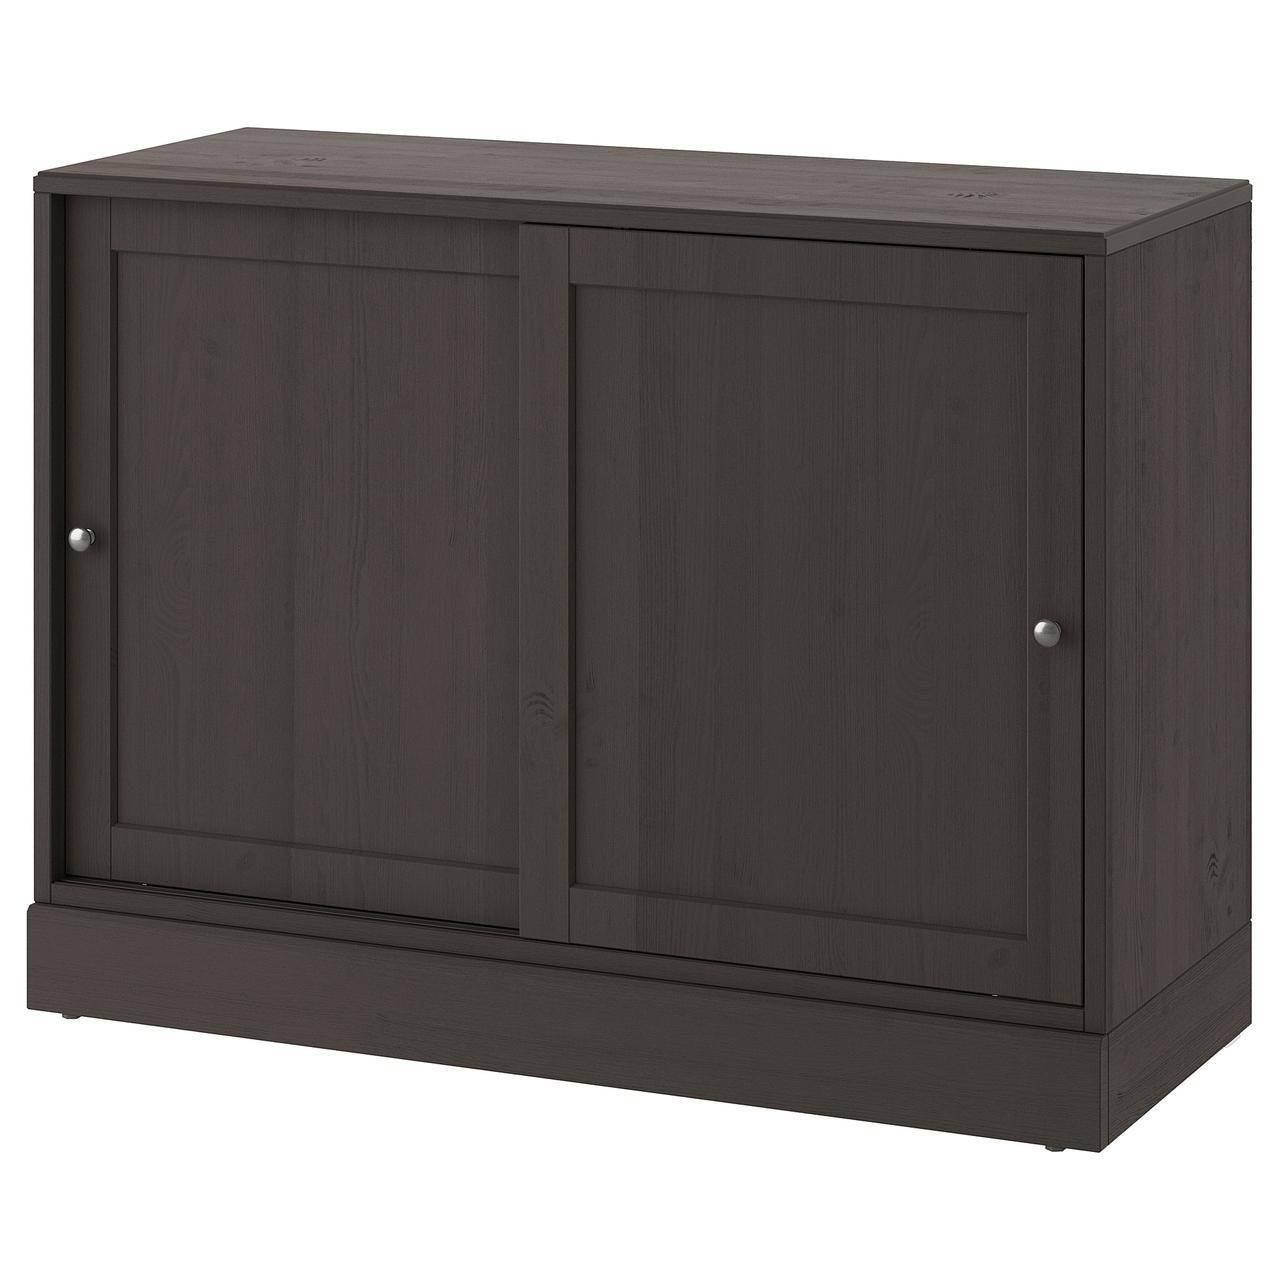 Тумба IKEA HAVSTA 121x89x47 см темно-коричневая 903.910.56